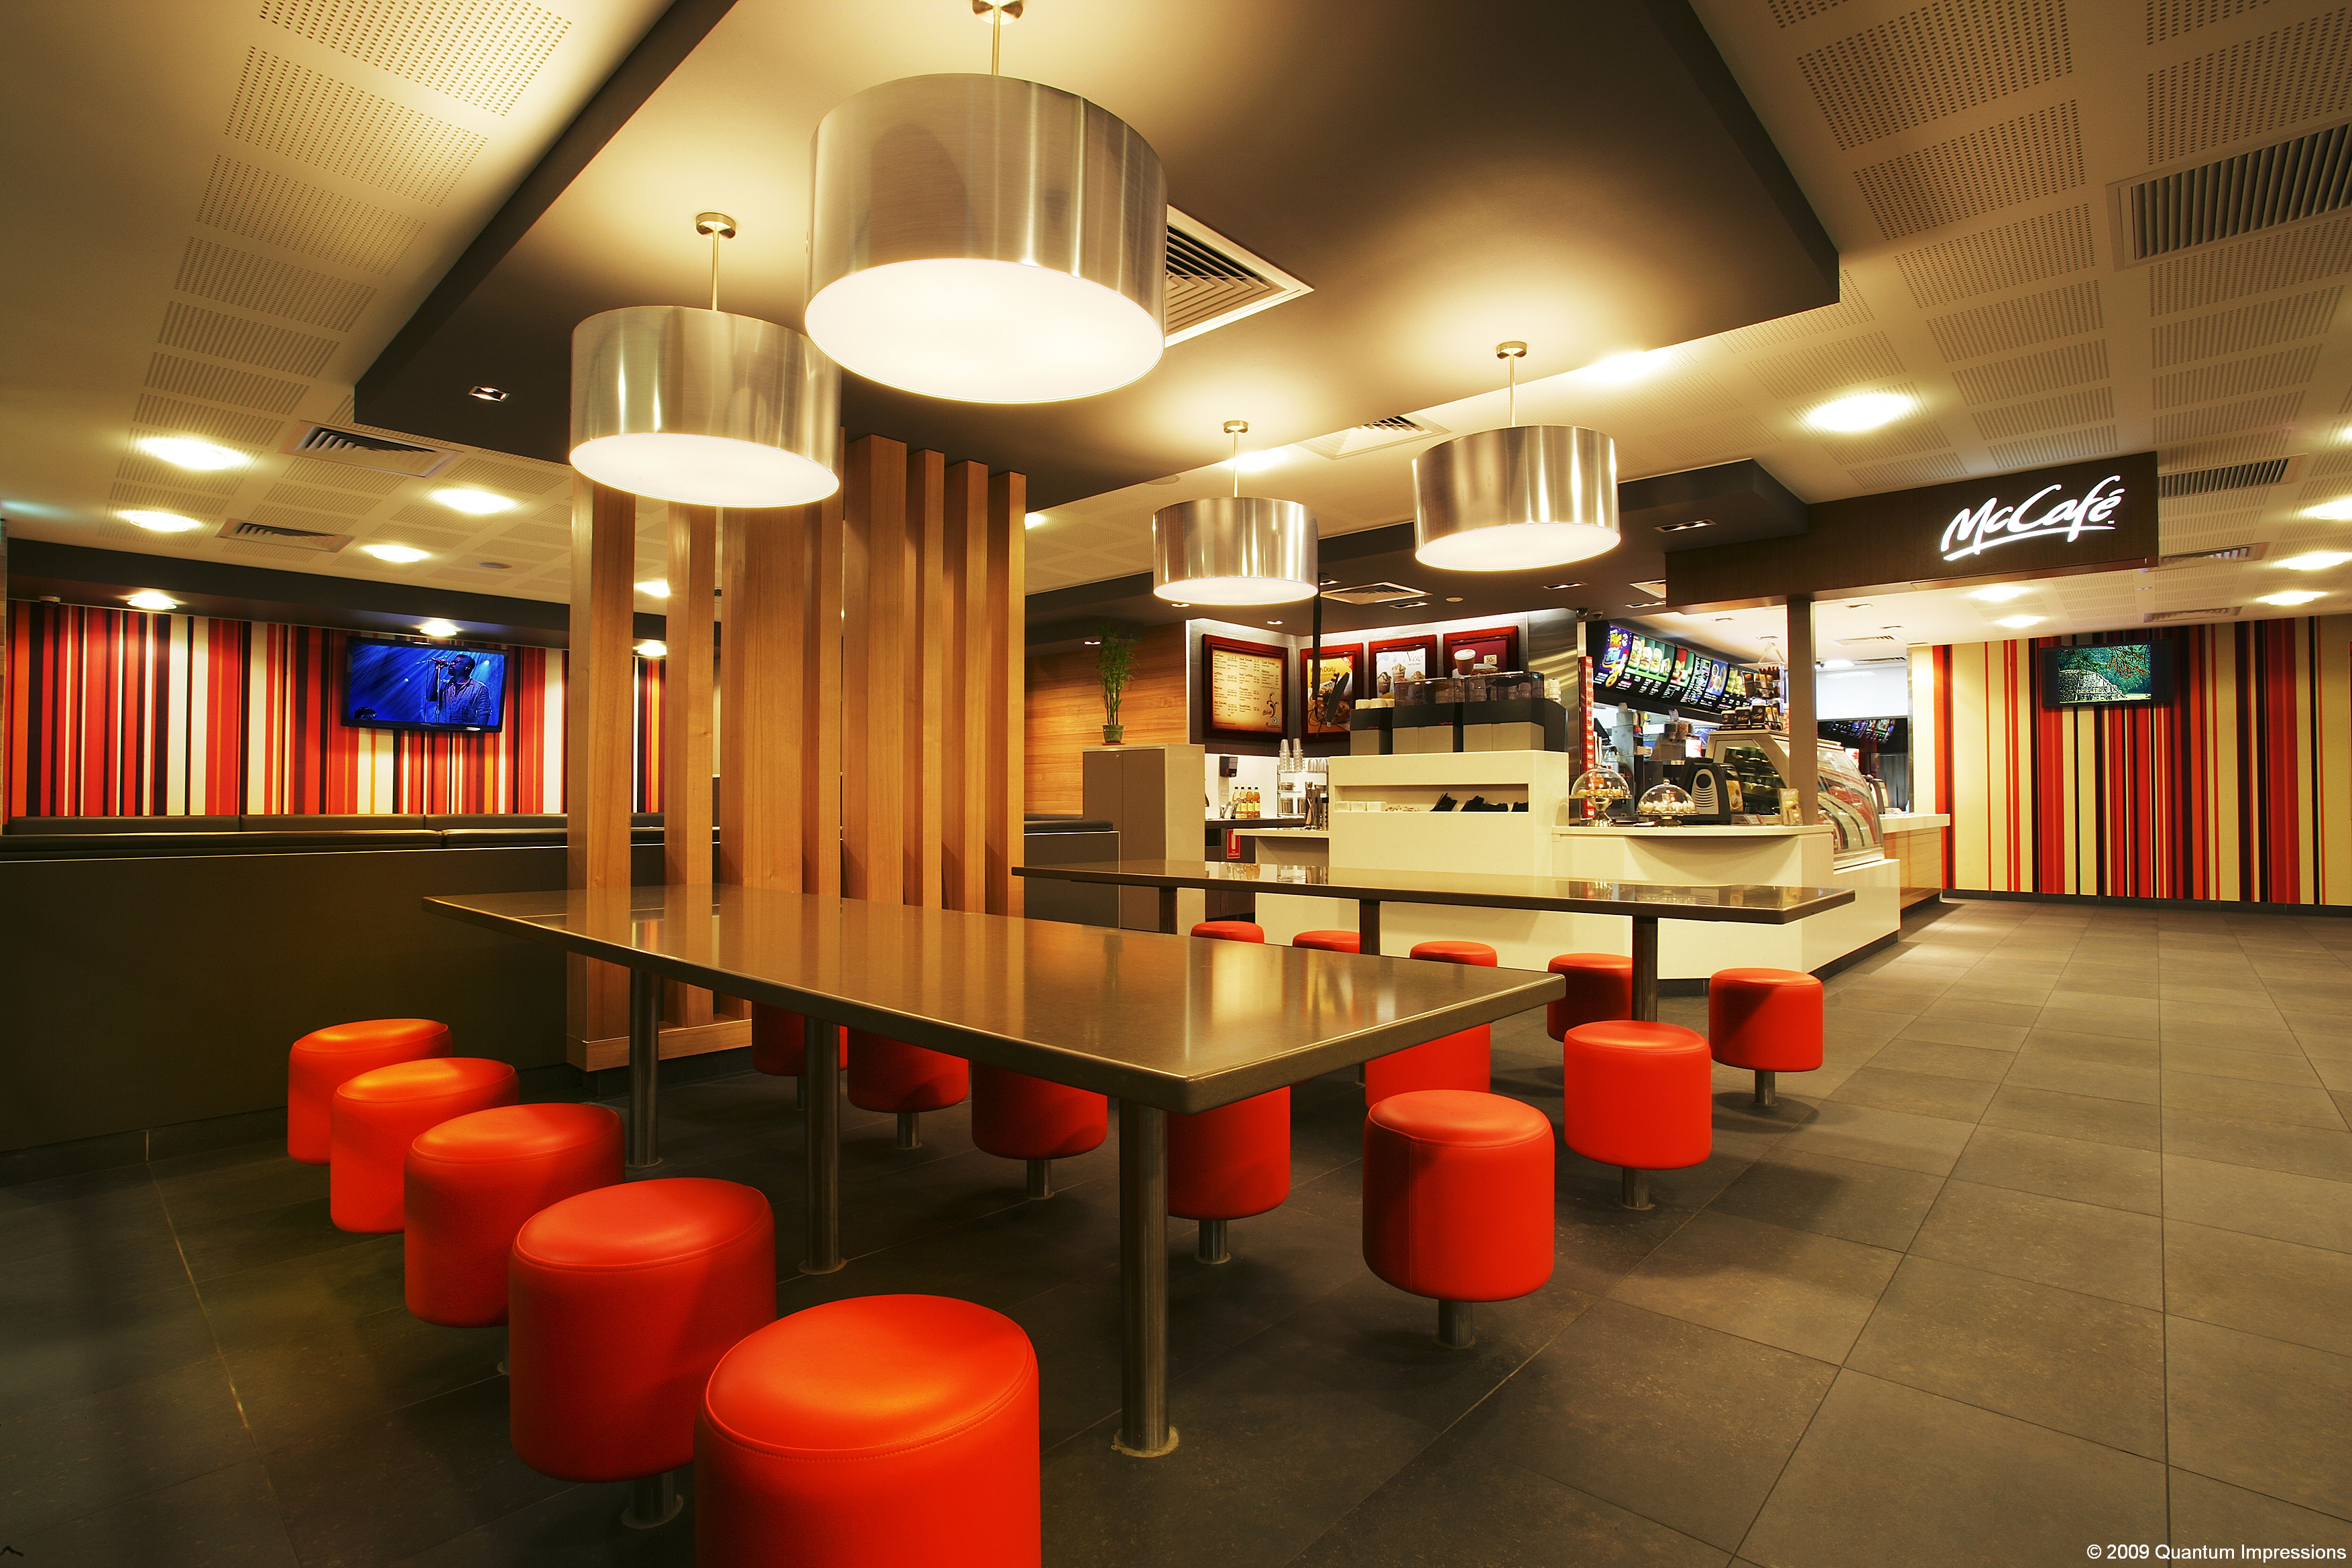 McDonalds Interior Dining